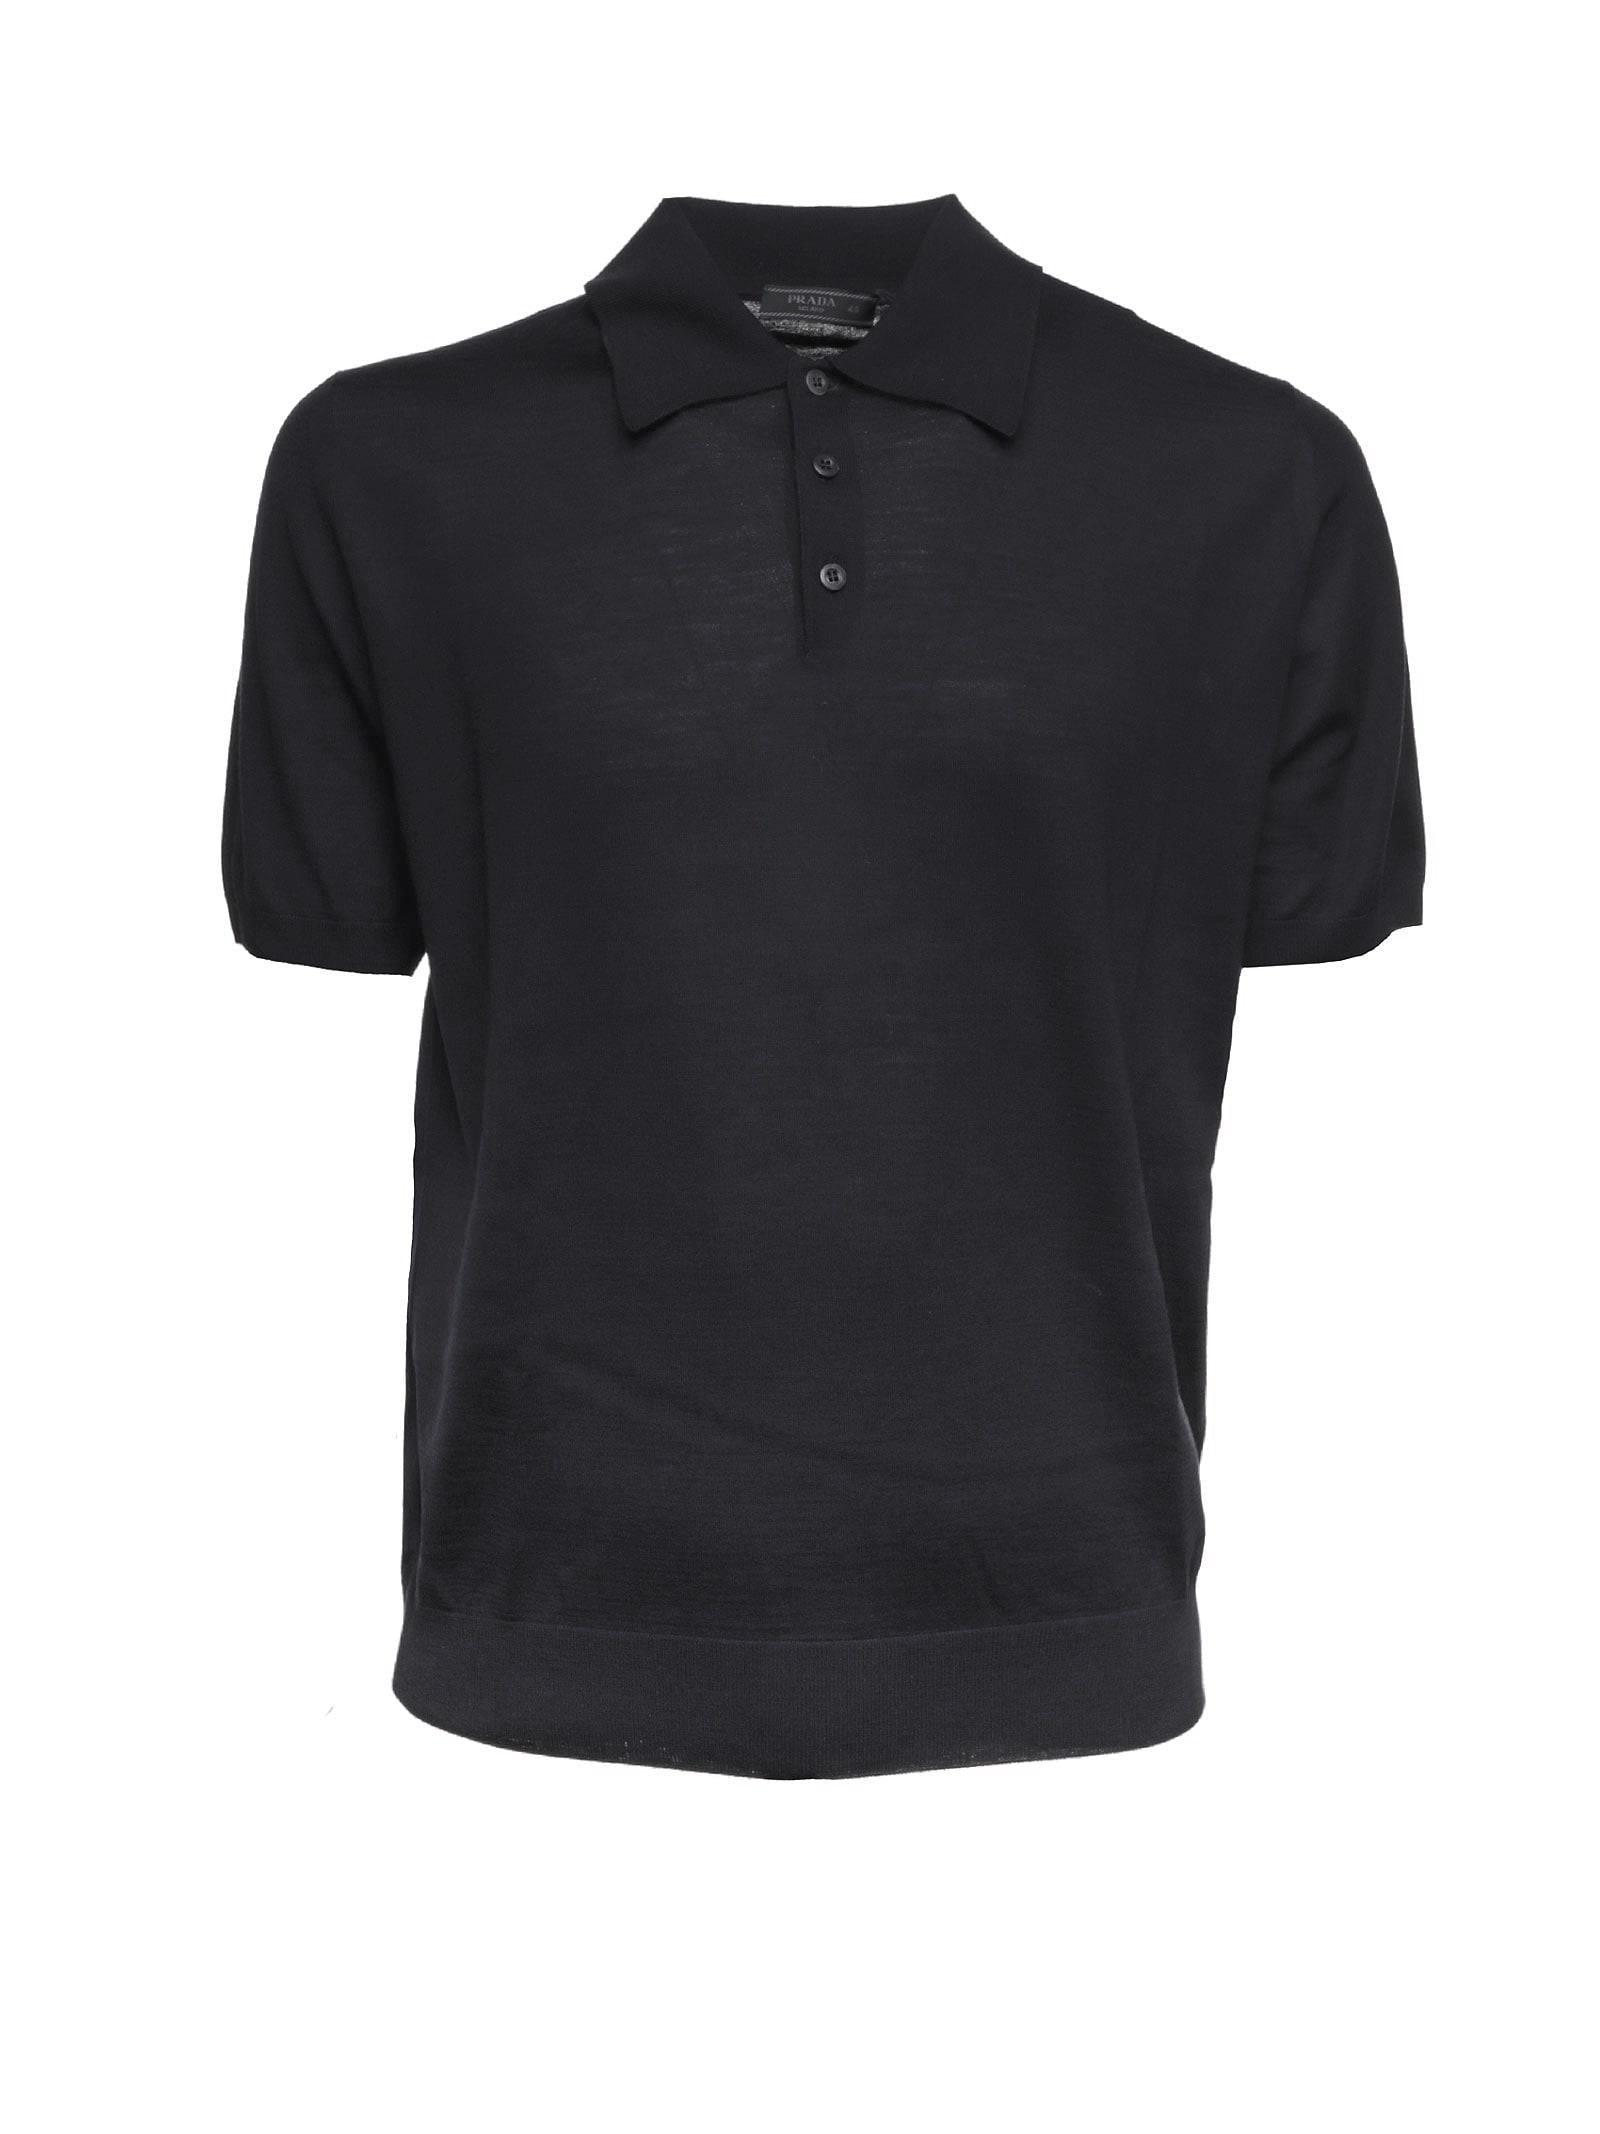 Prada Prada Wool Polo Shirt